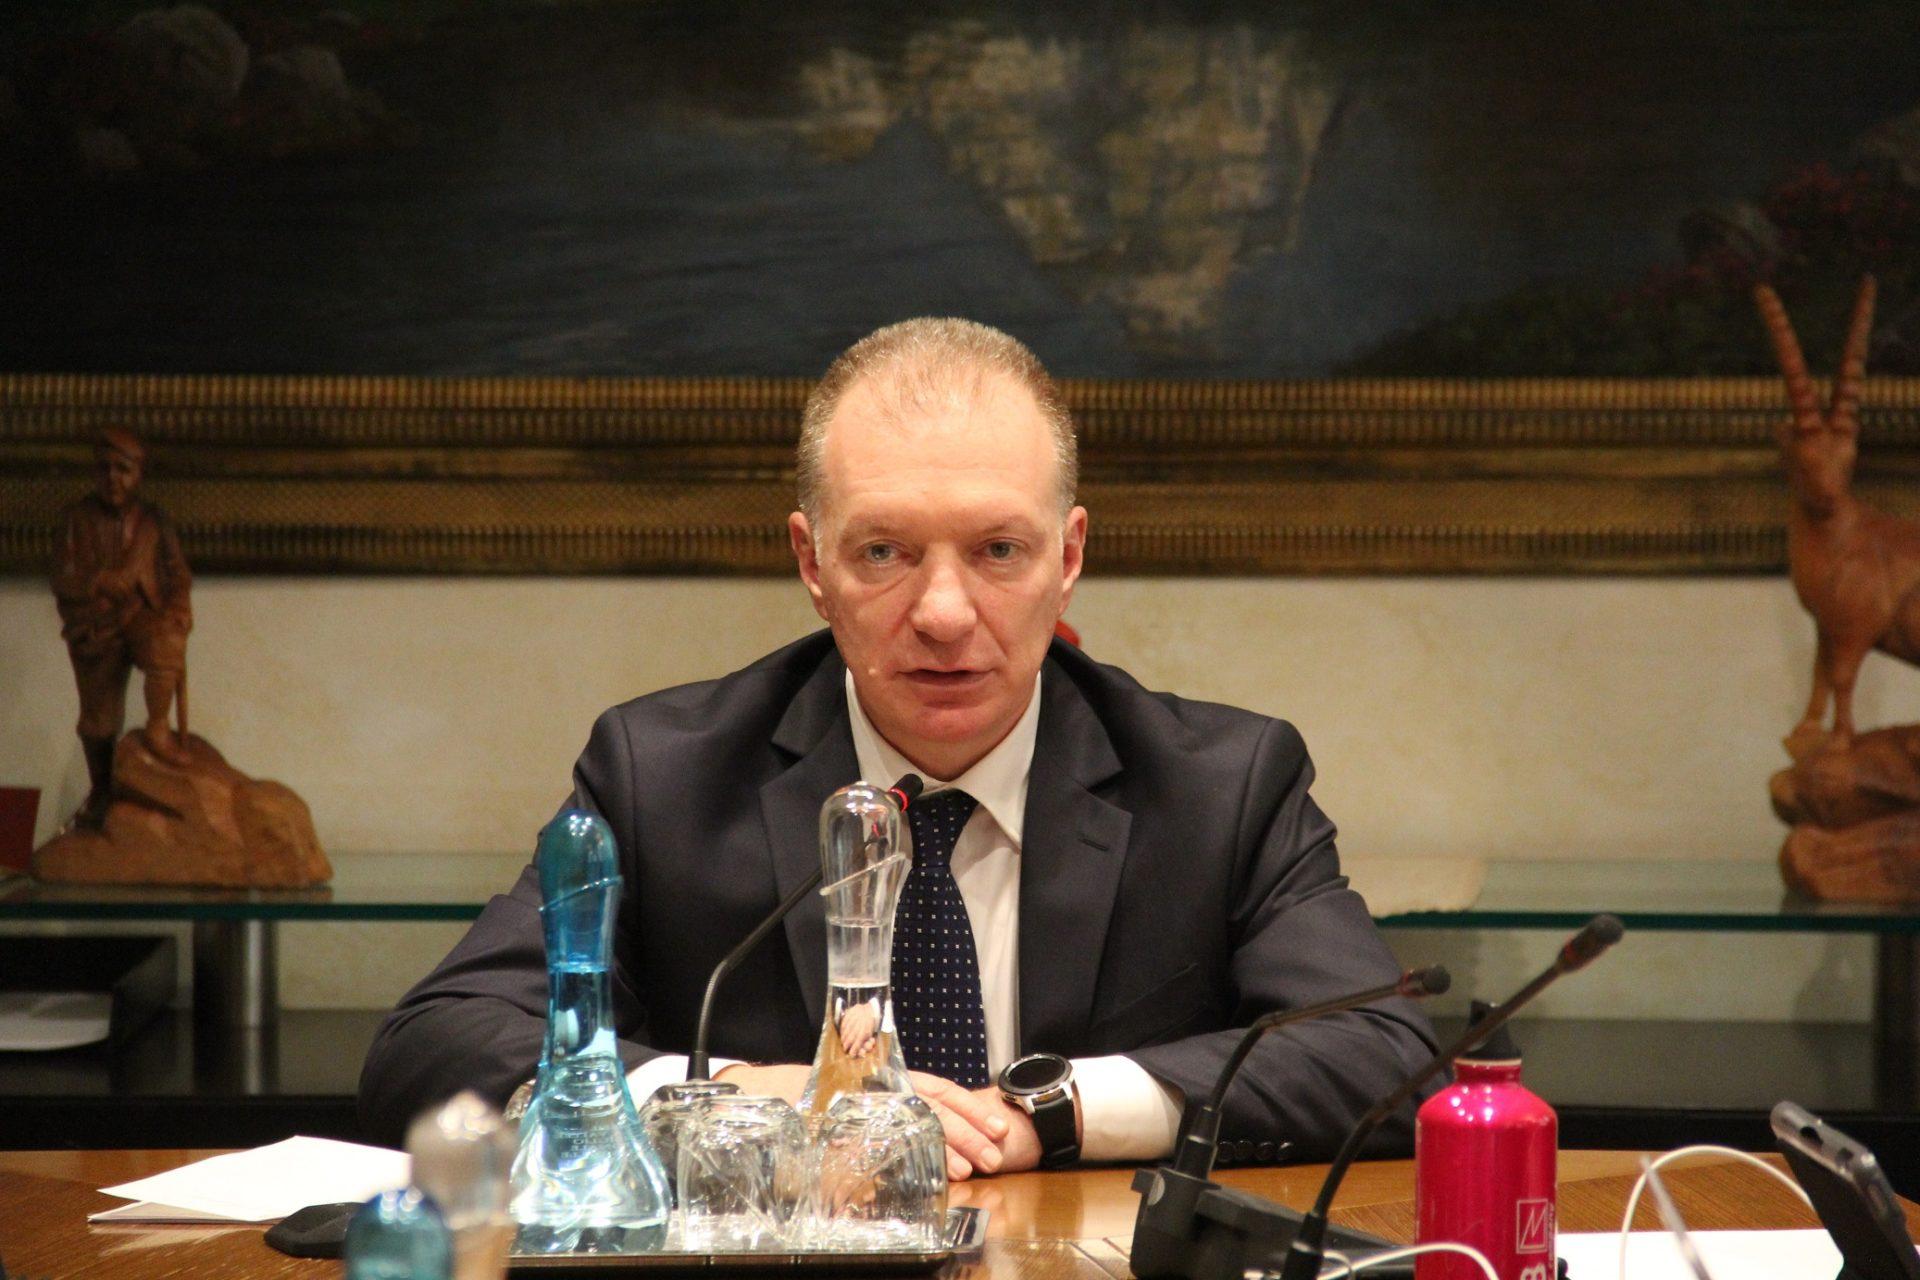 Questore Ivo Morelli